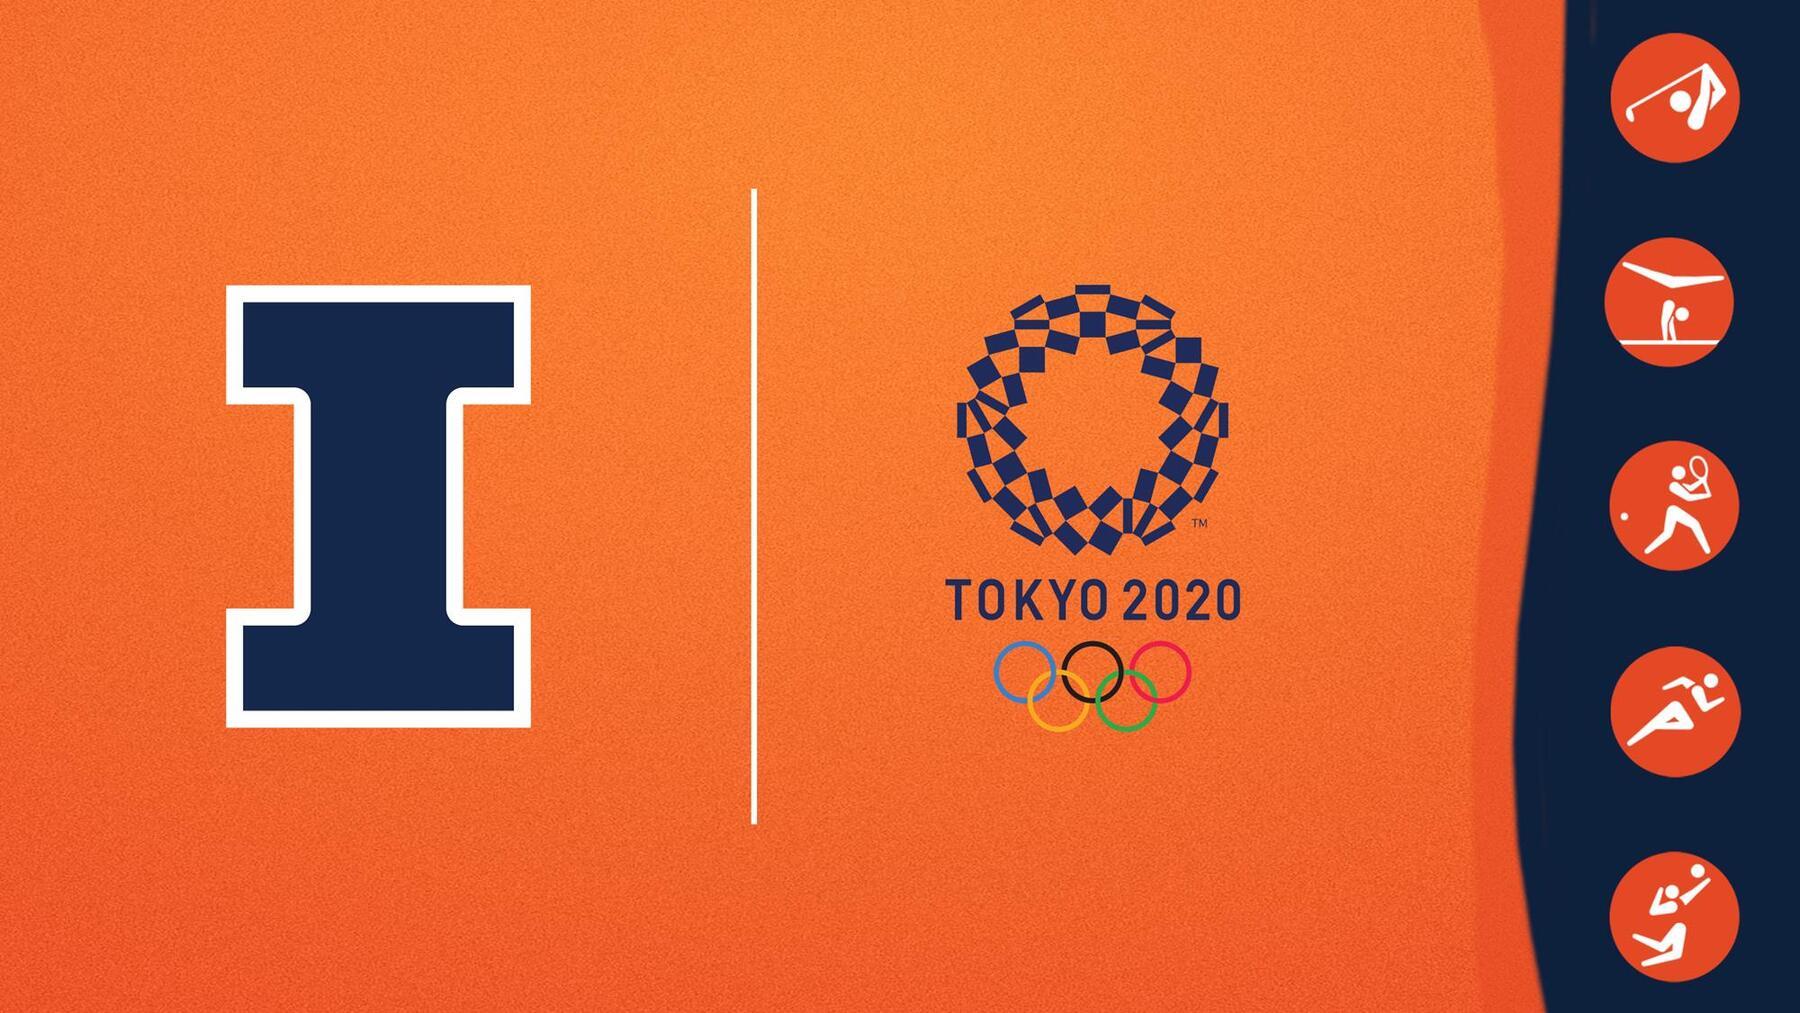 graphic using U of I and Tokyo Olympics logos